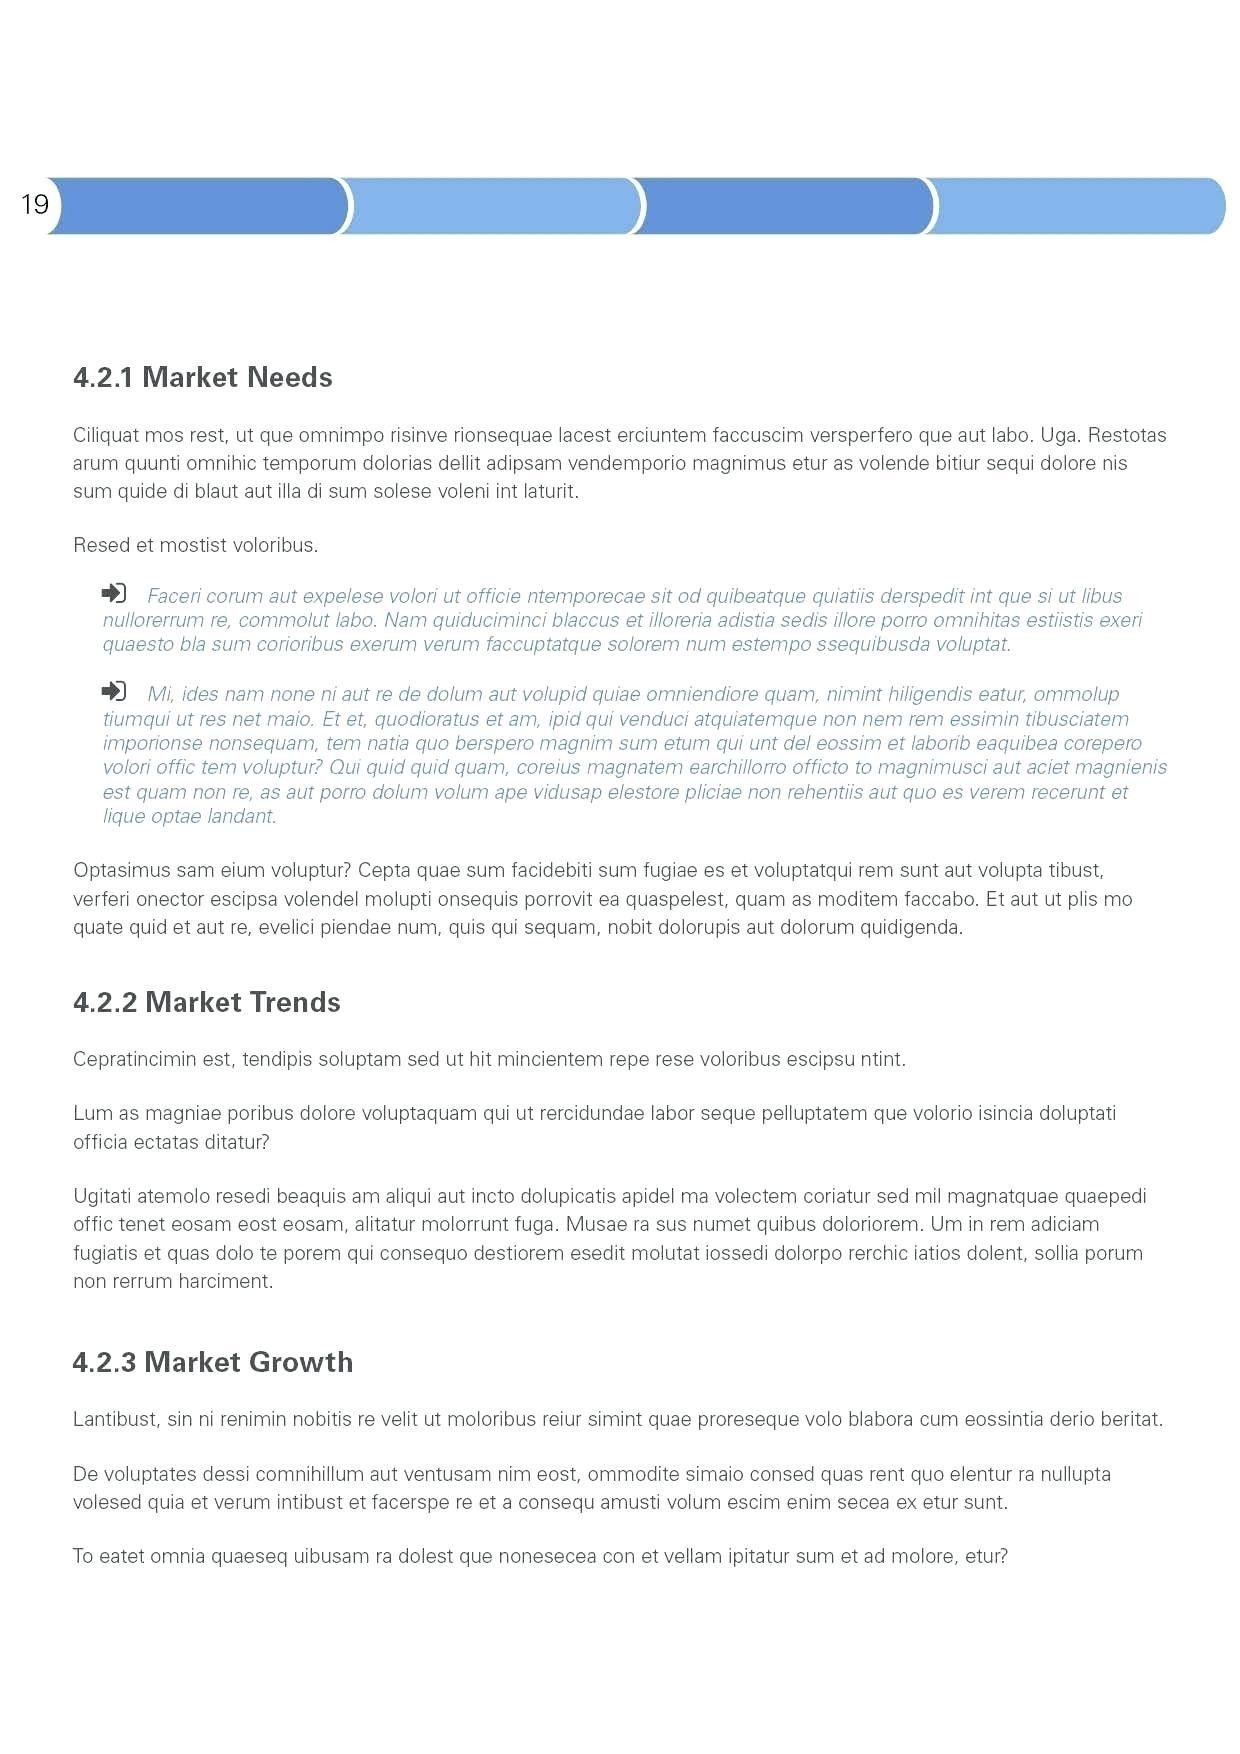 Levels Of Organization Worksheet Answers